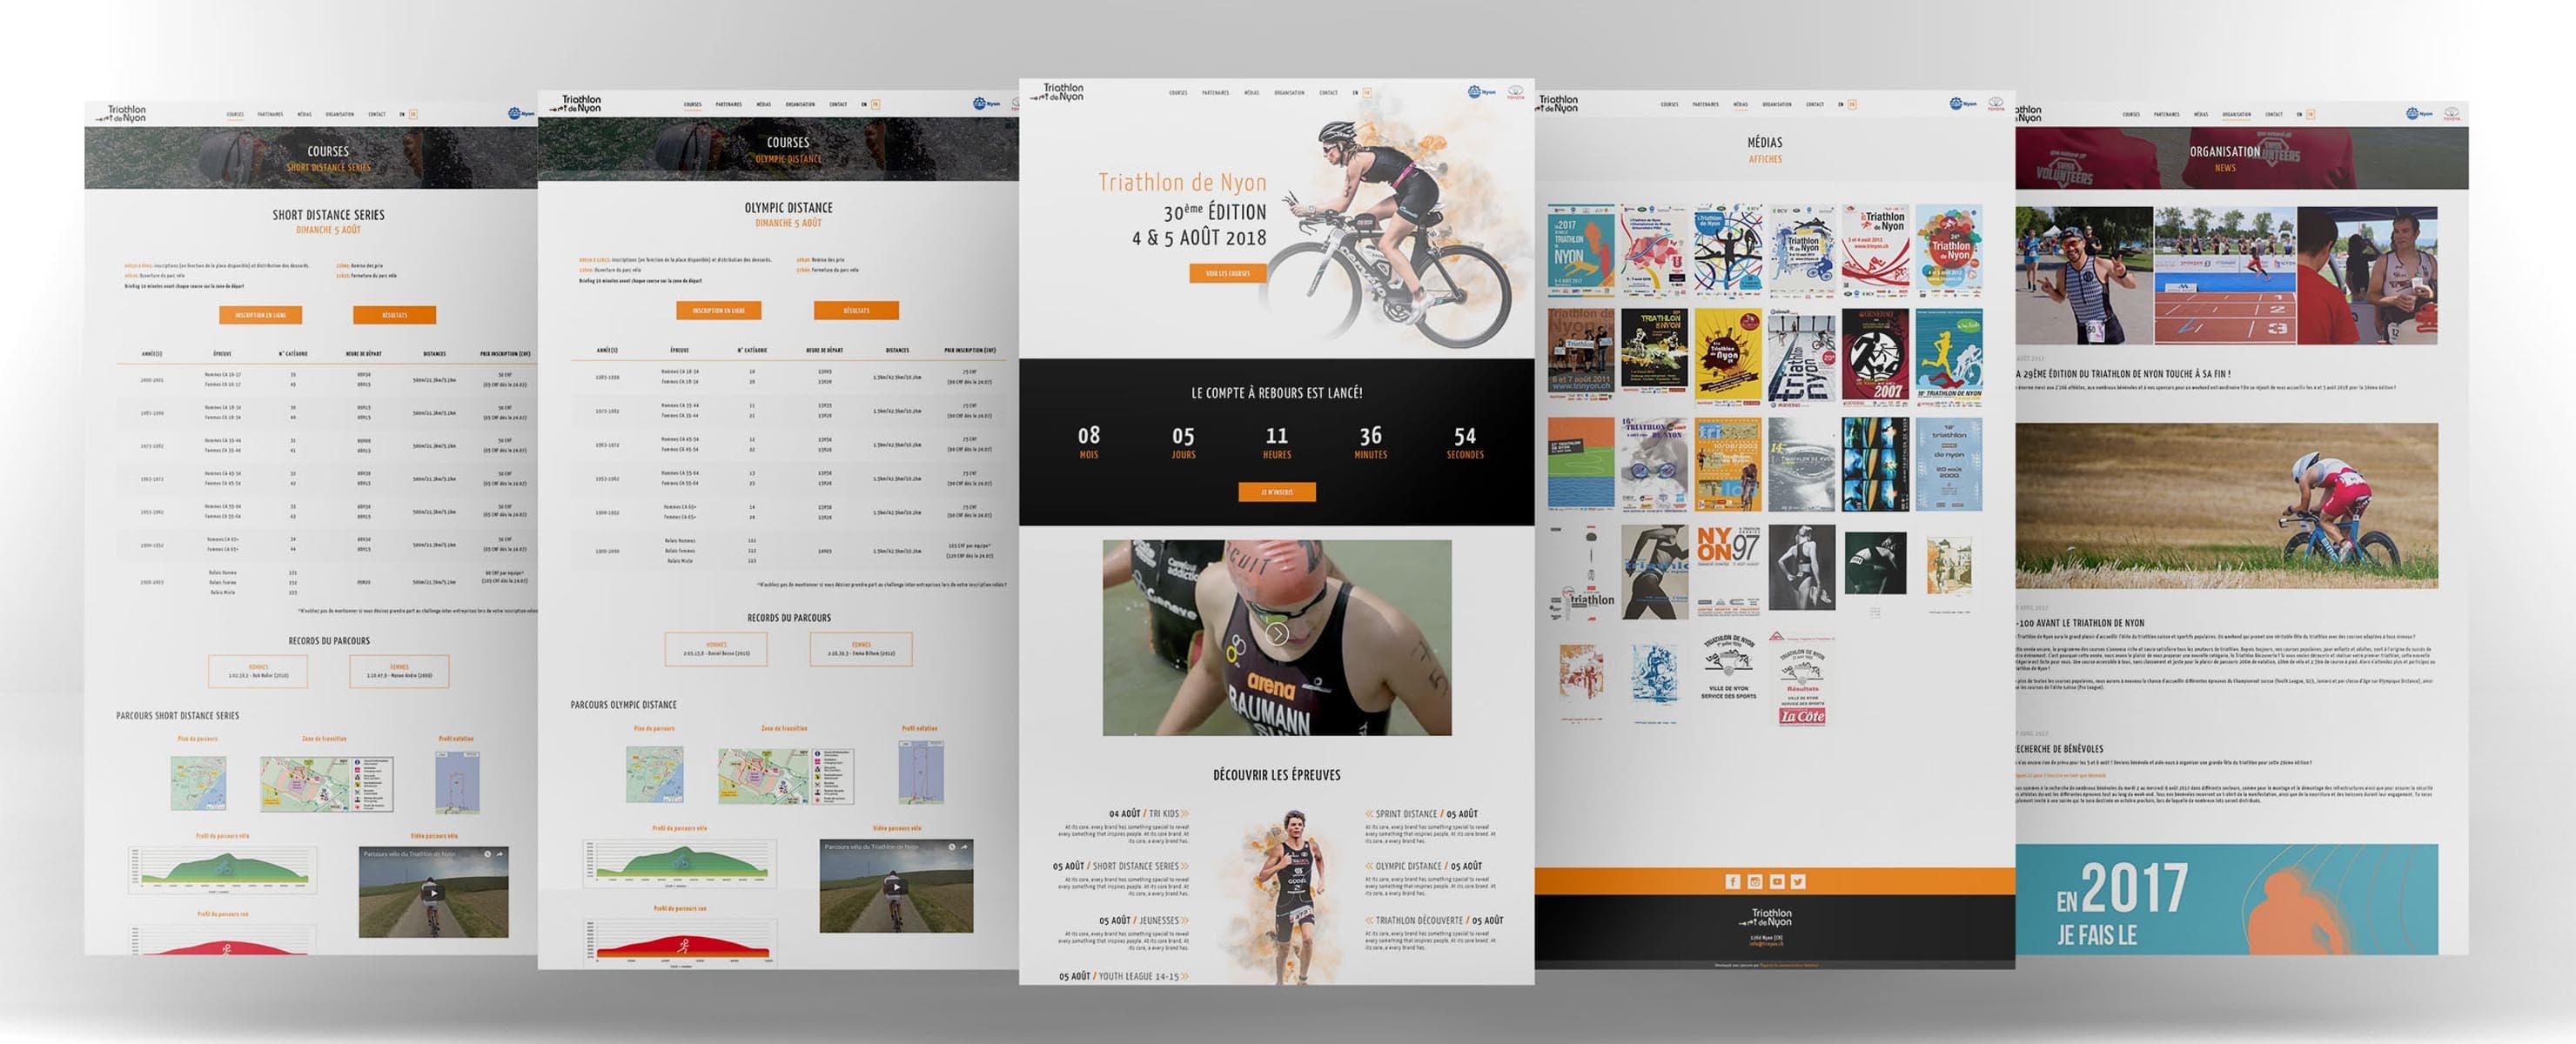 Habefast Etude De Cas Triathlon Nyon Site Bandeau Full